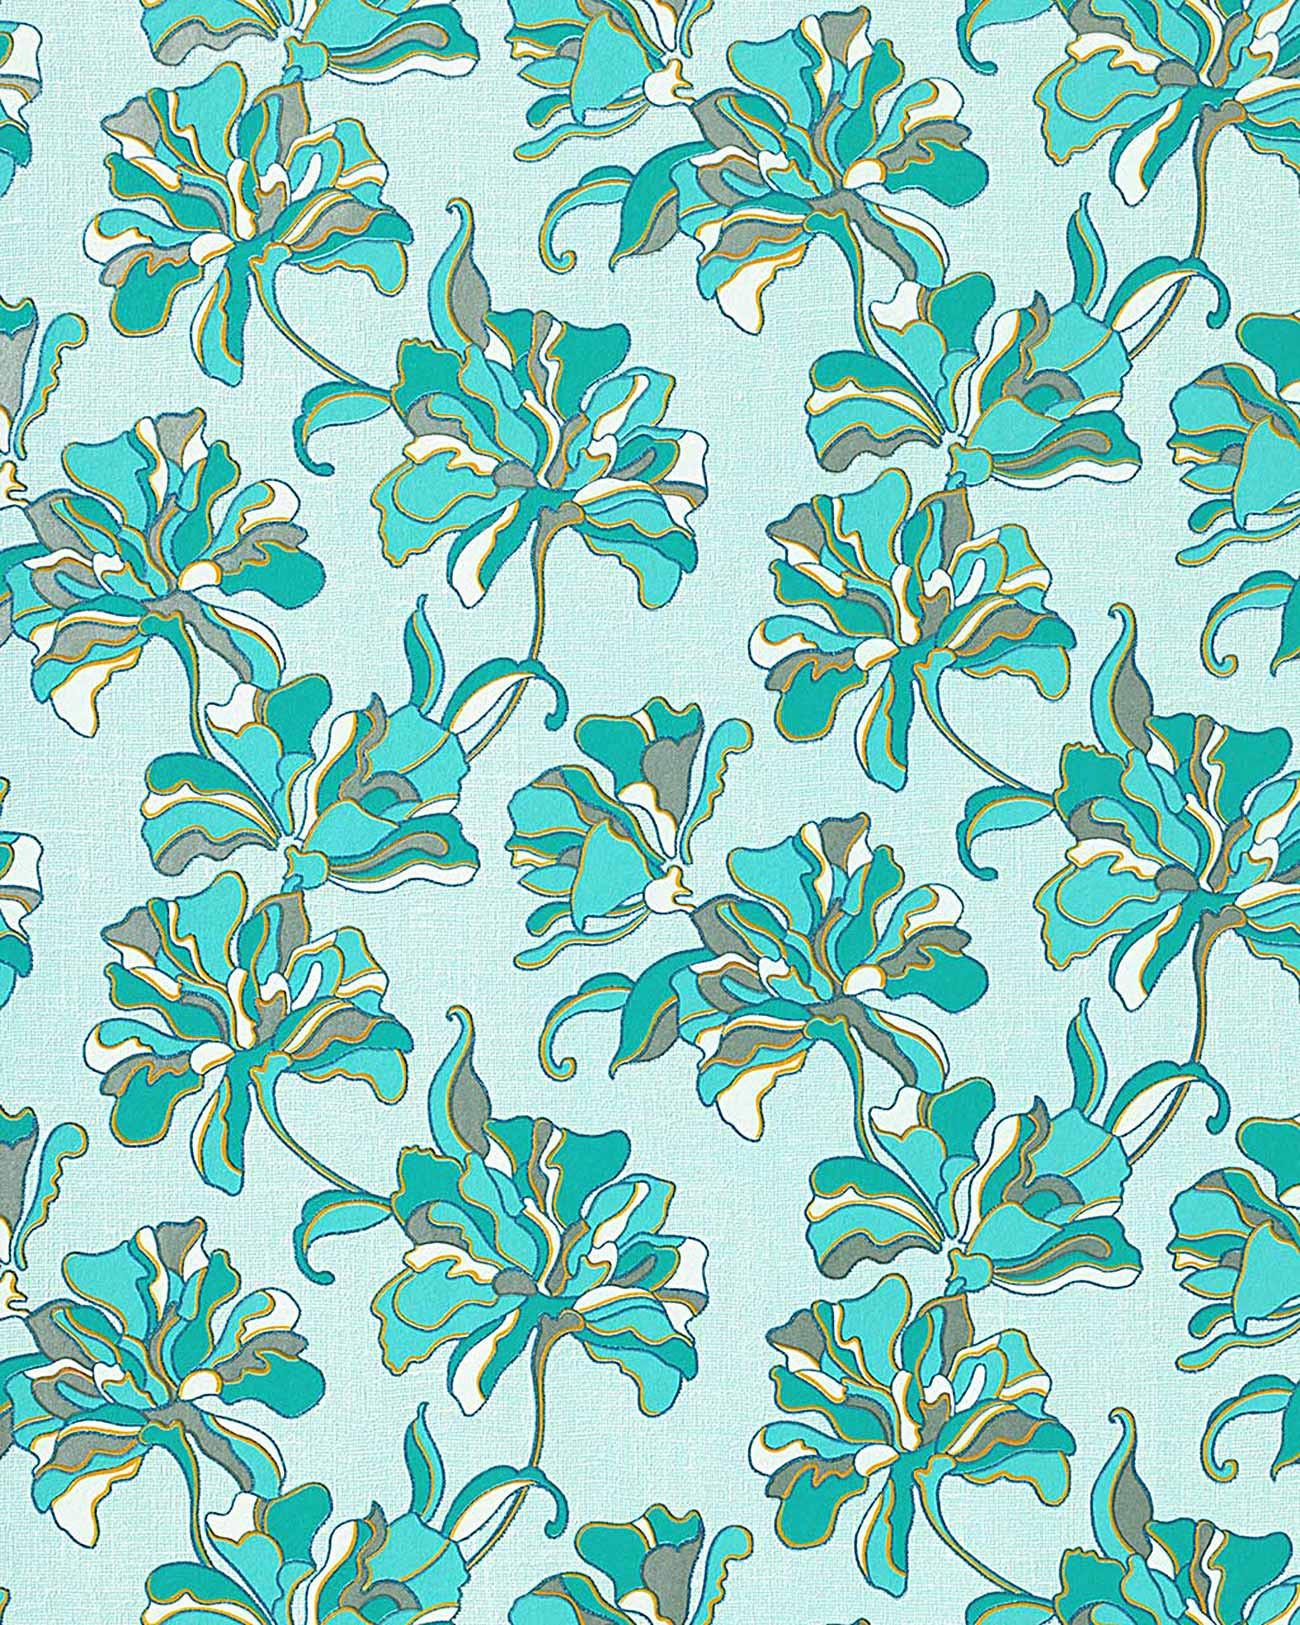 Free Download Home Wallpaper Flower Floral Wallpaper 1300x1625